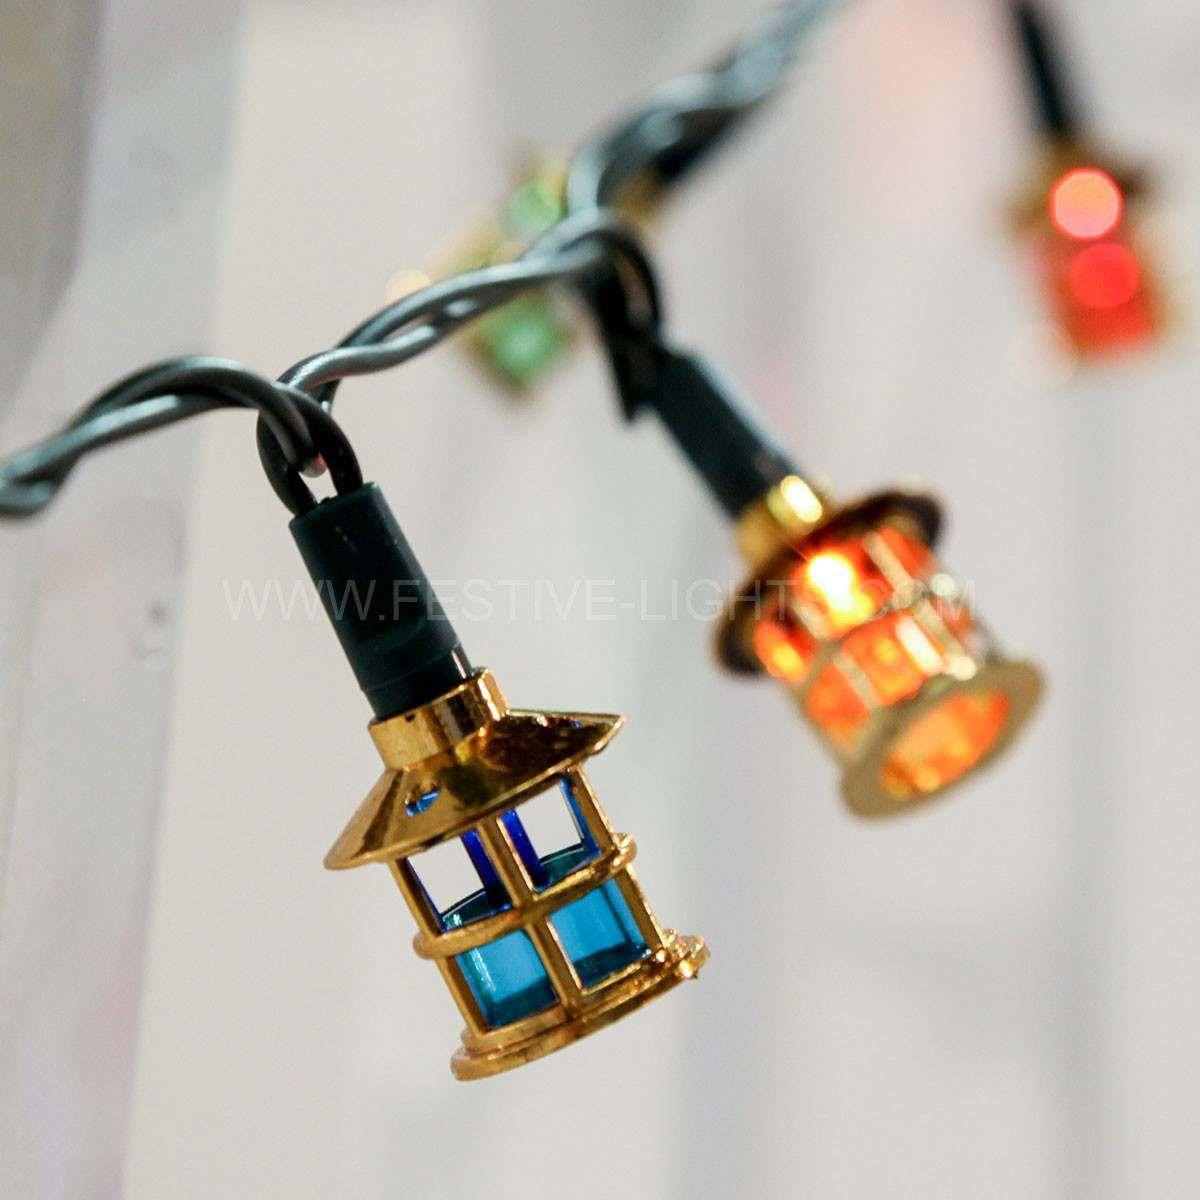 5.8m Traditional Lantern Fairy Lights, 40 Multi Coloured Filament Bulbs